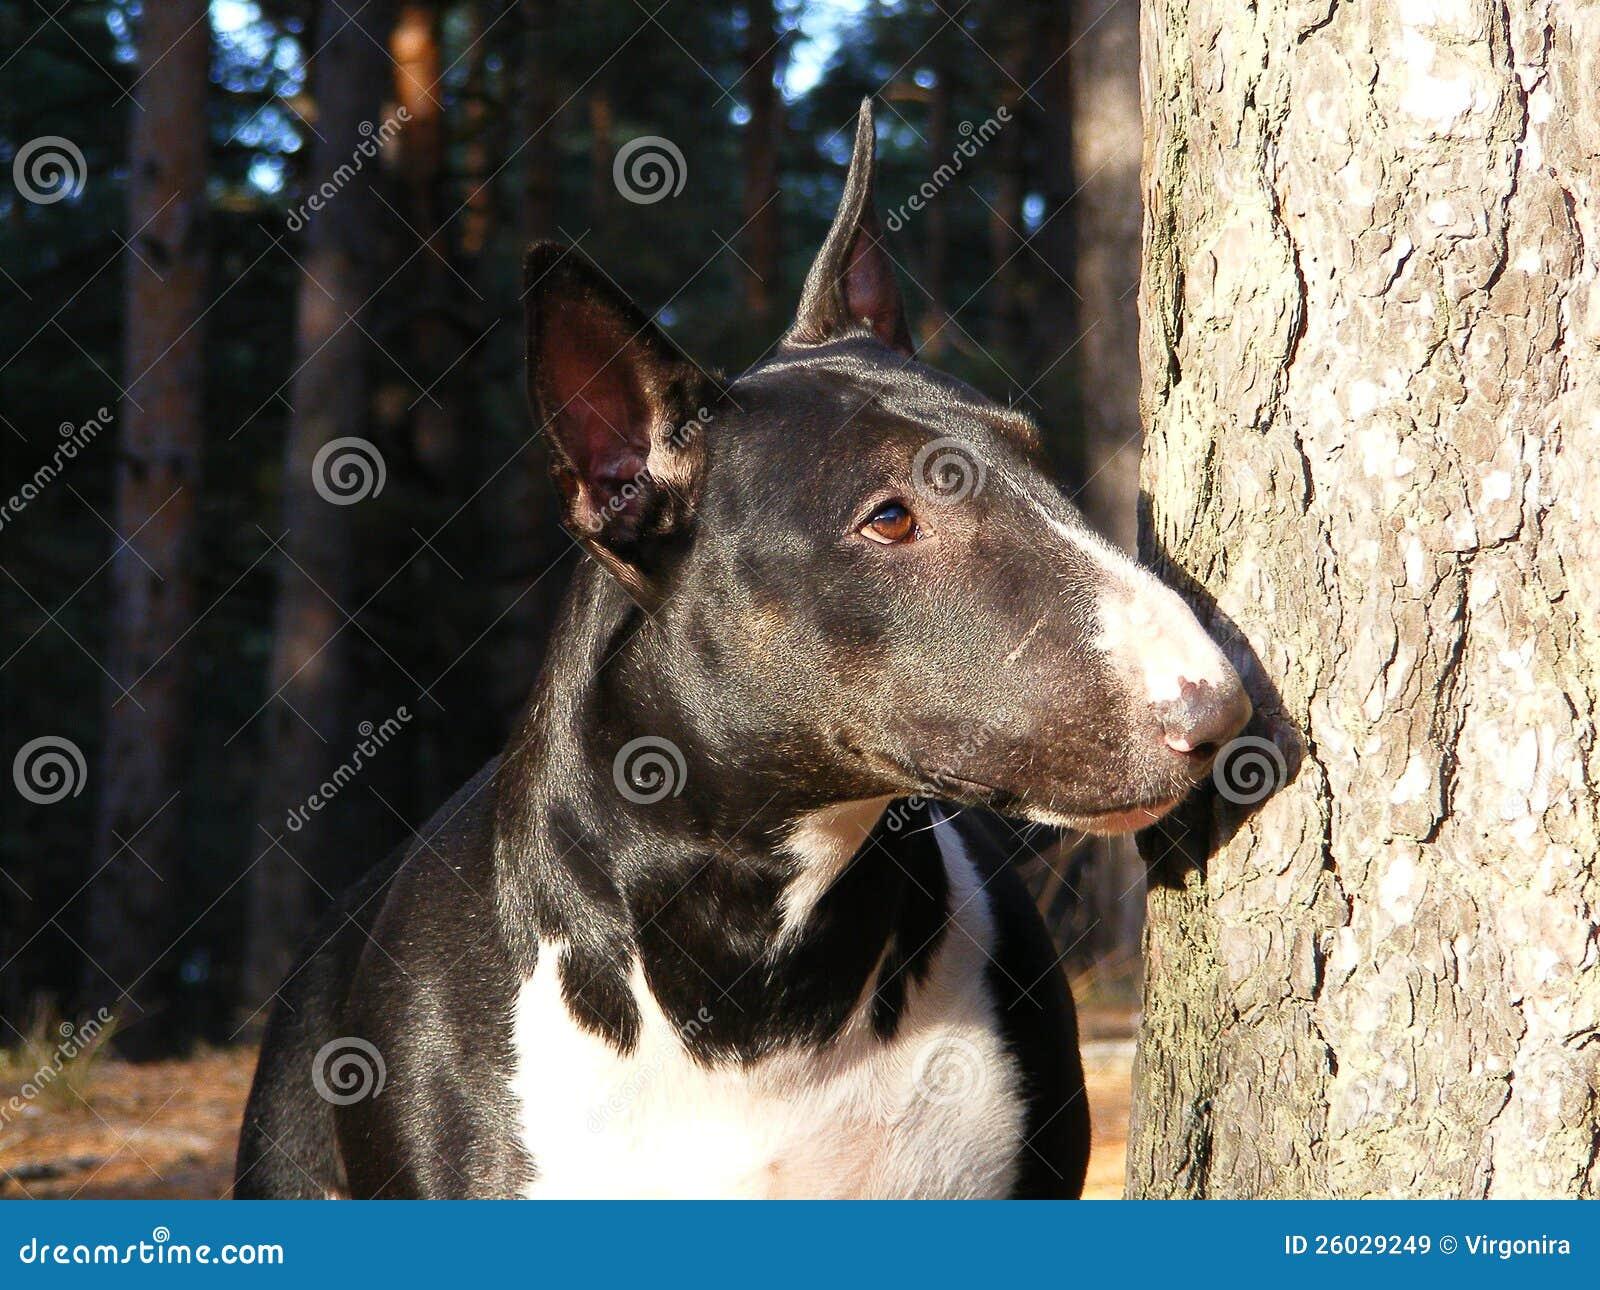 Black And White Bull Terrier Portrait Royalty Free Stock ...